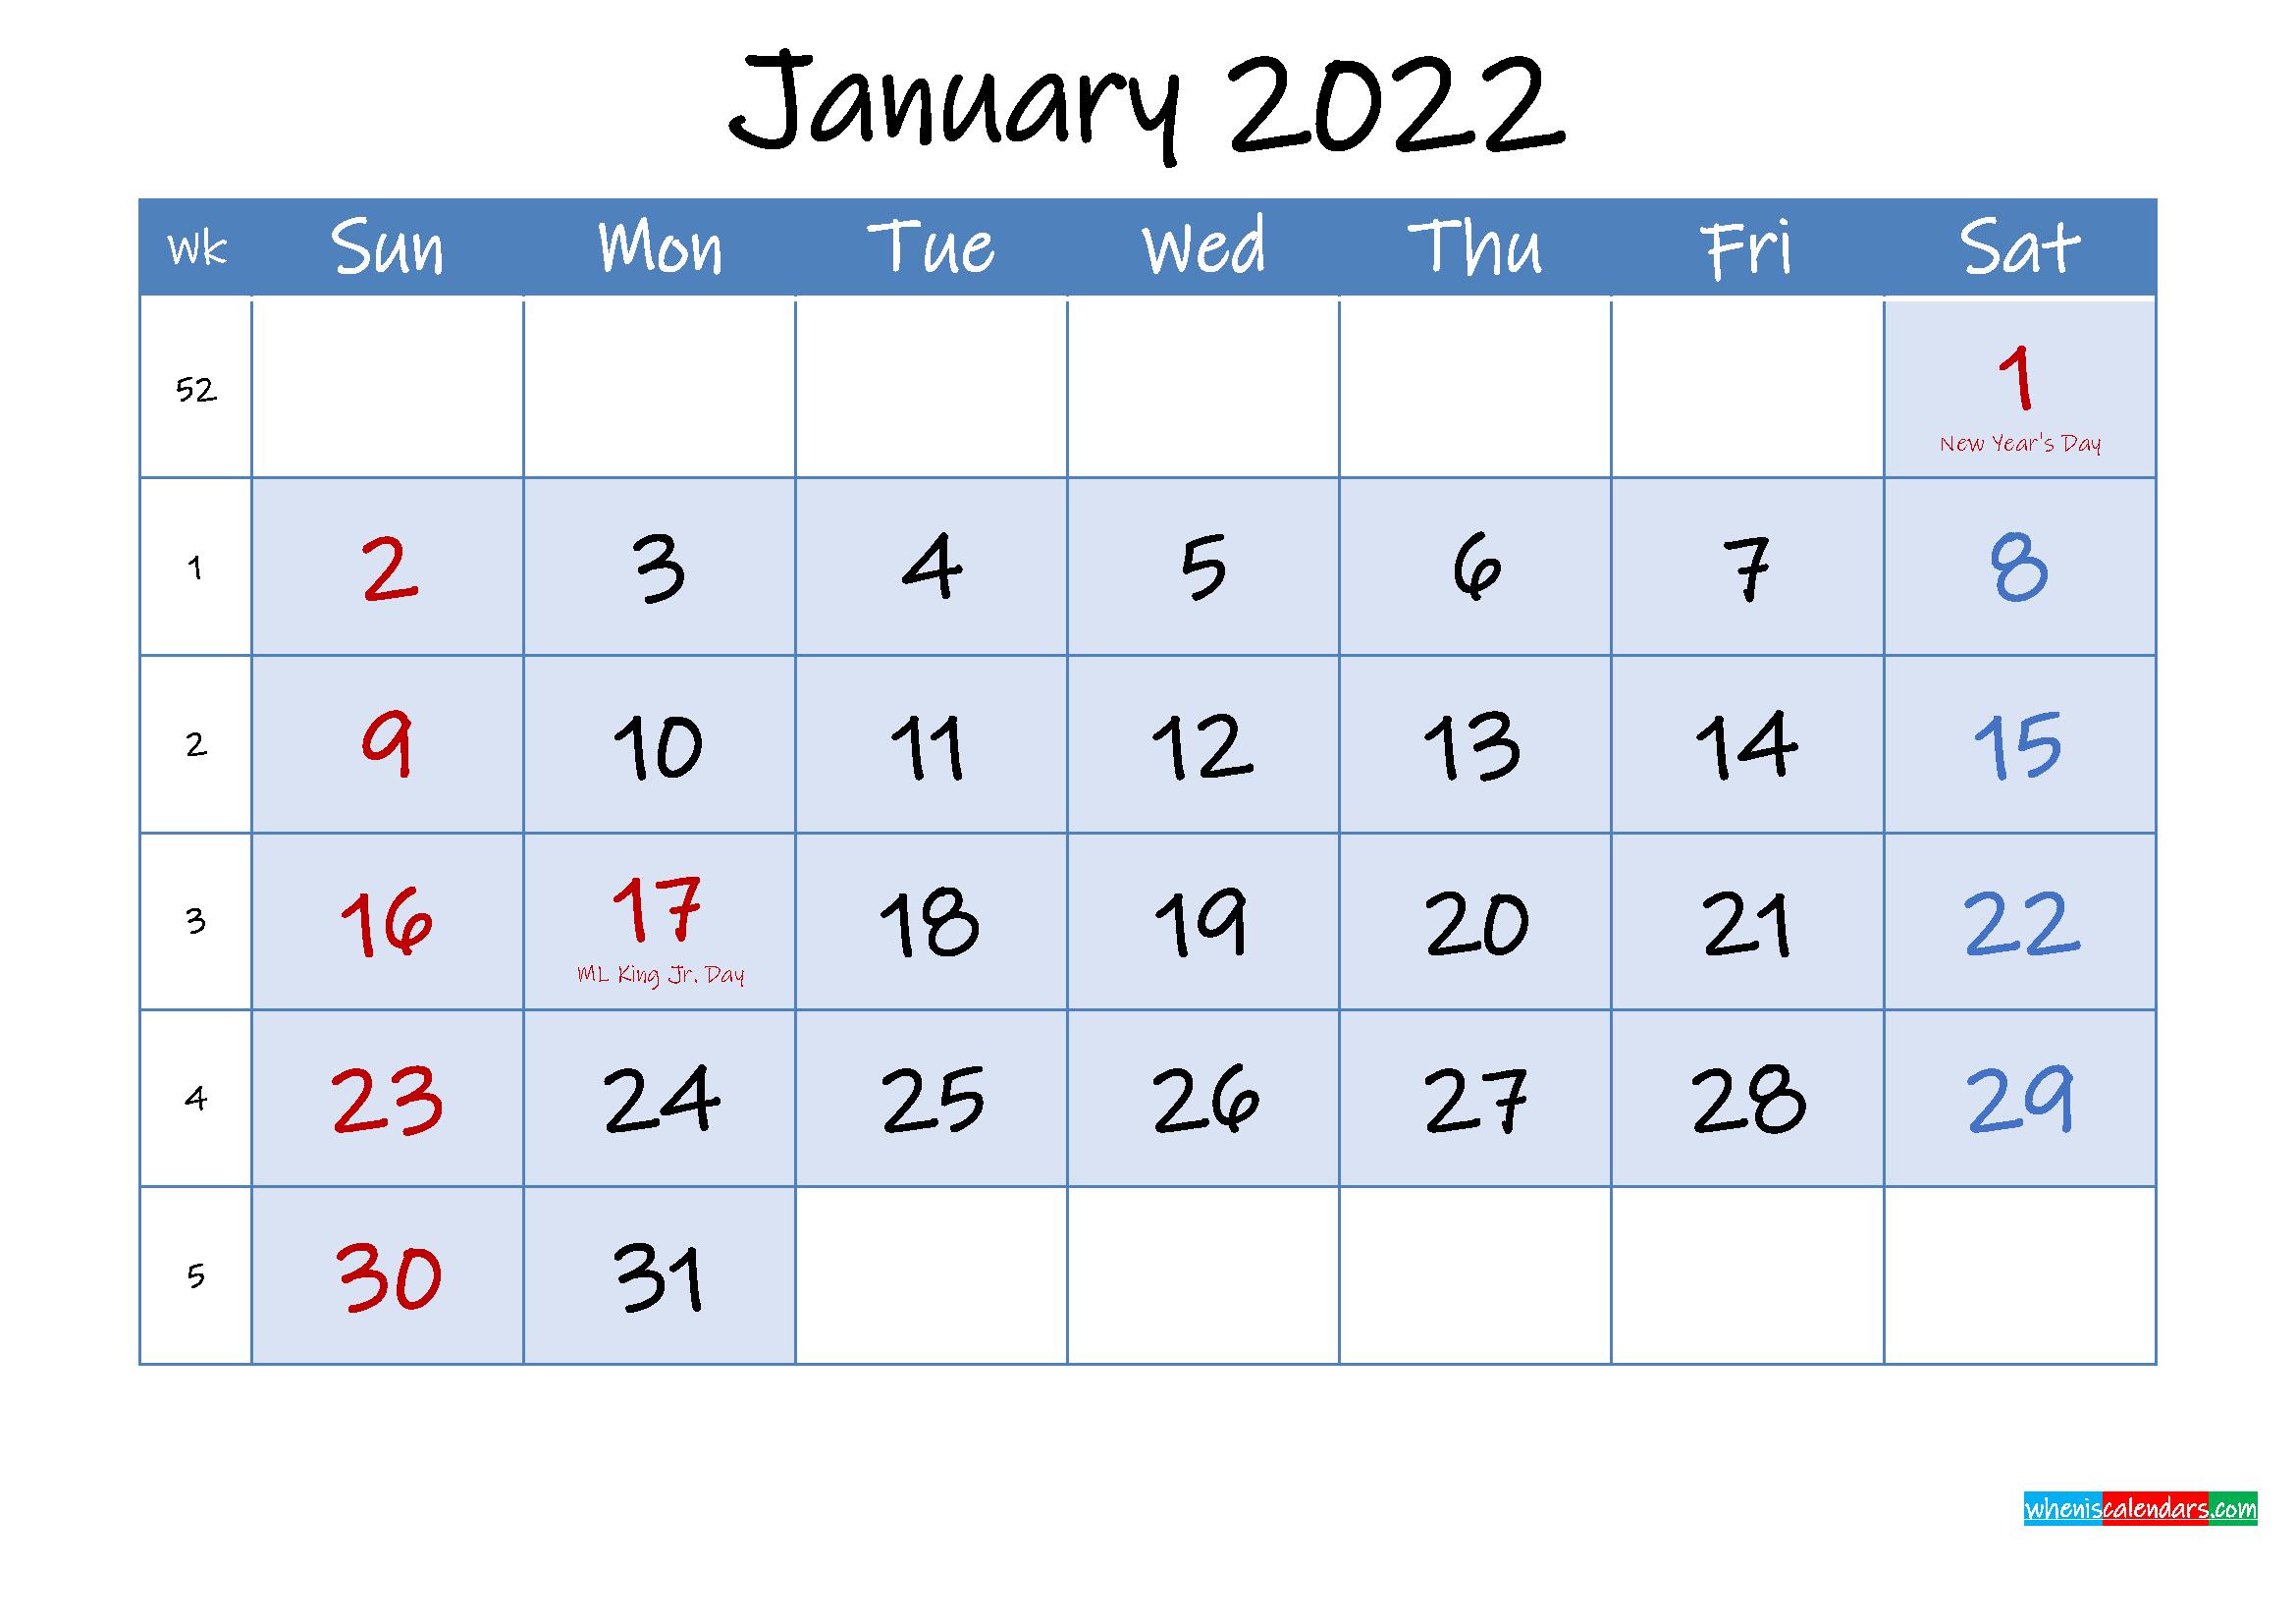 Free Printable January 2022 Calendar - Template ink22m97 ...